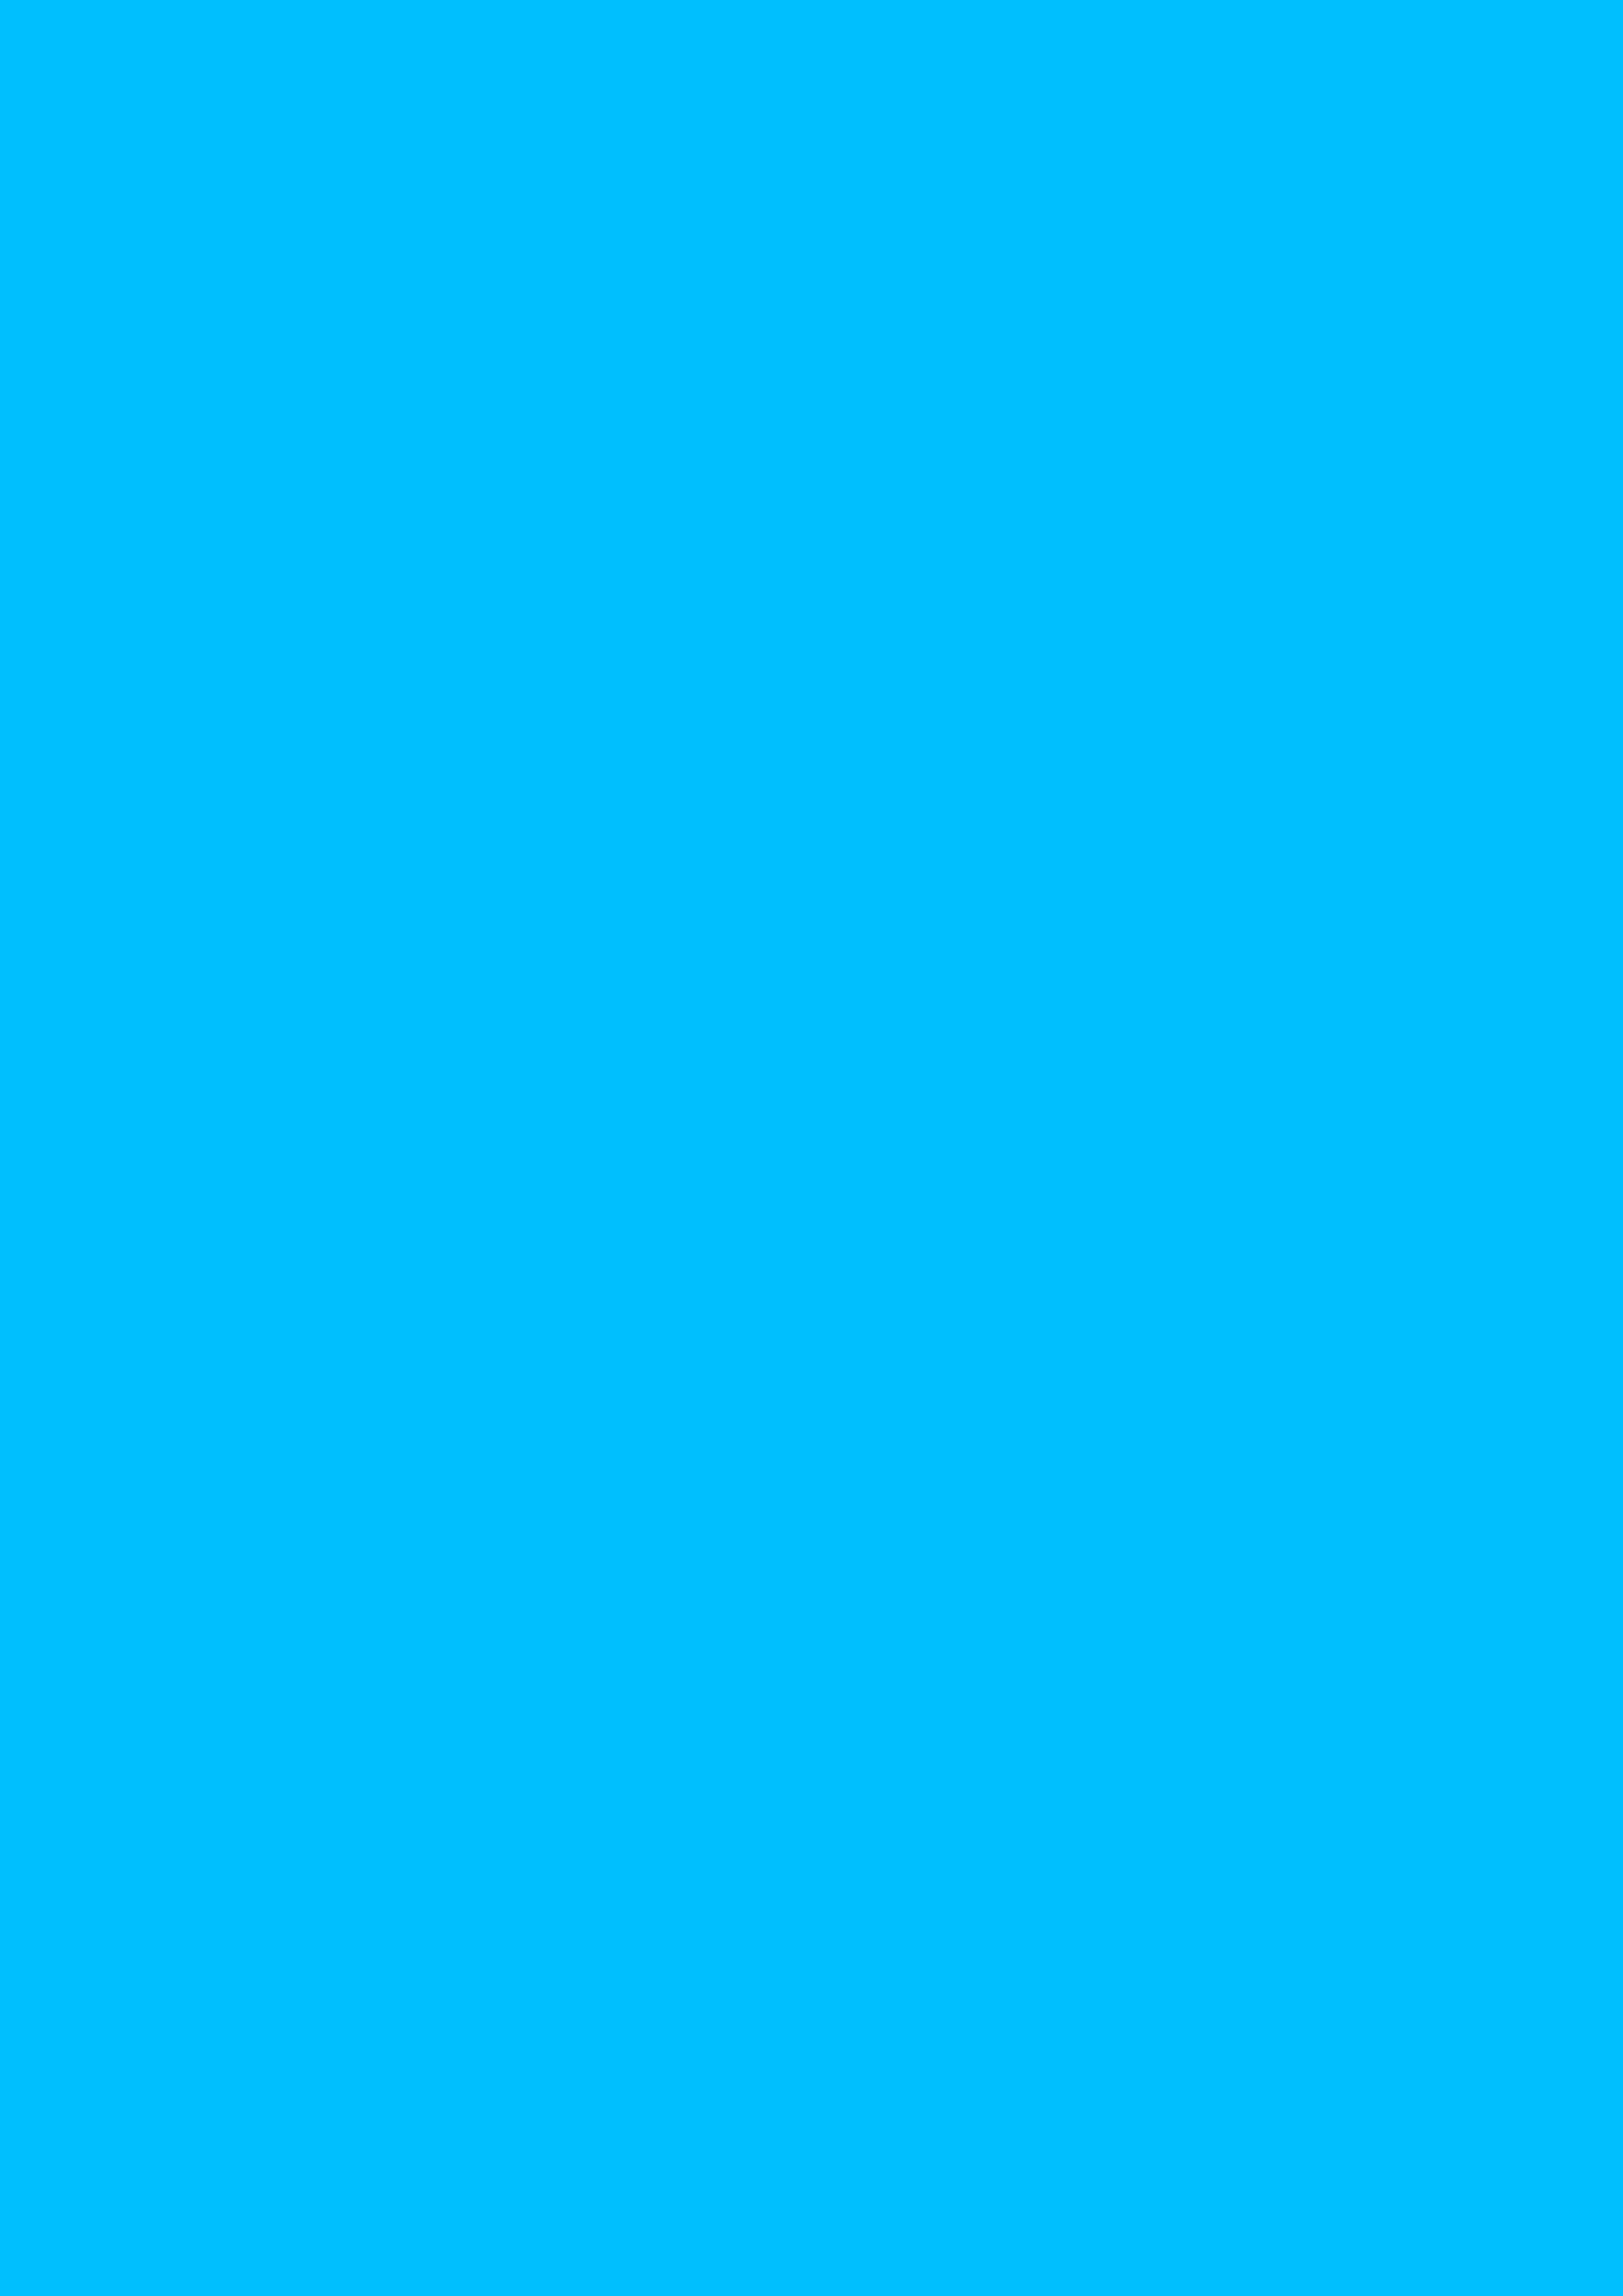 2480x3508 Deep Sky Blue Solid Color Background